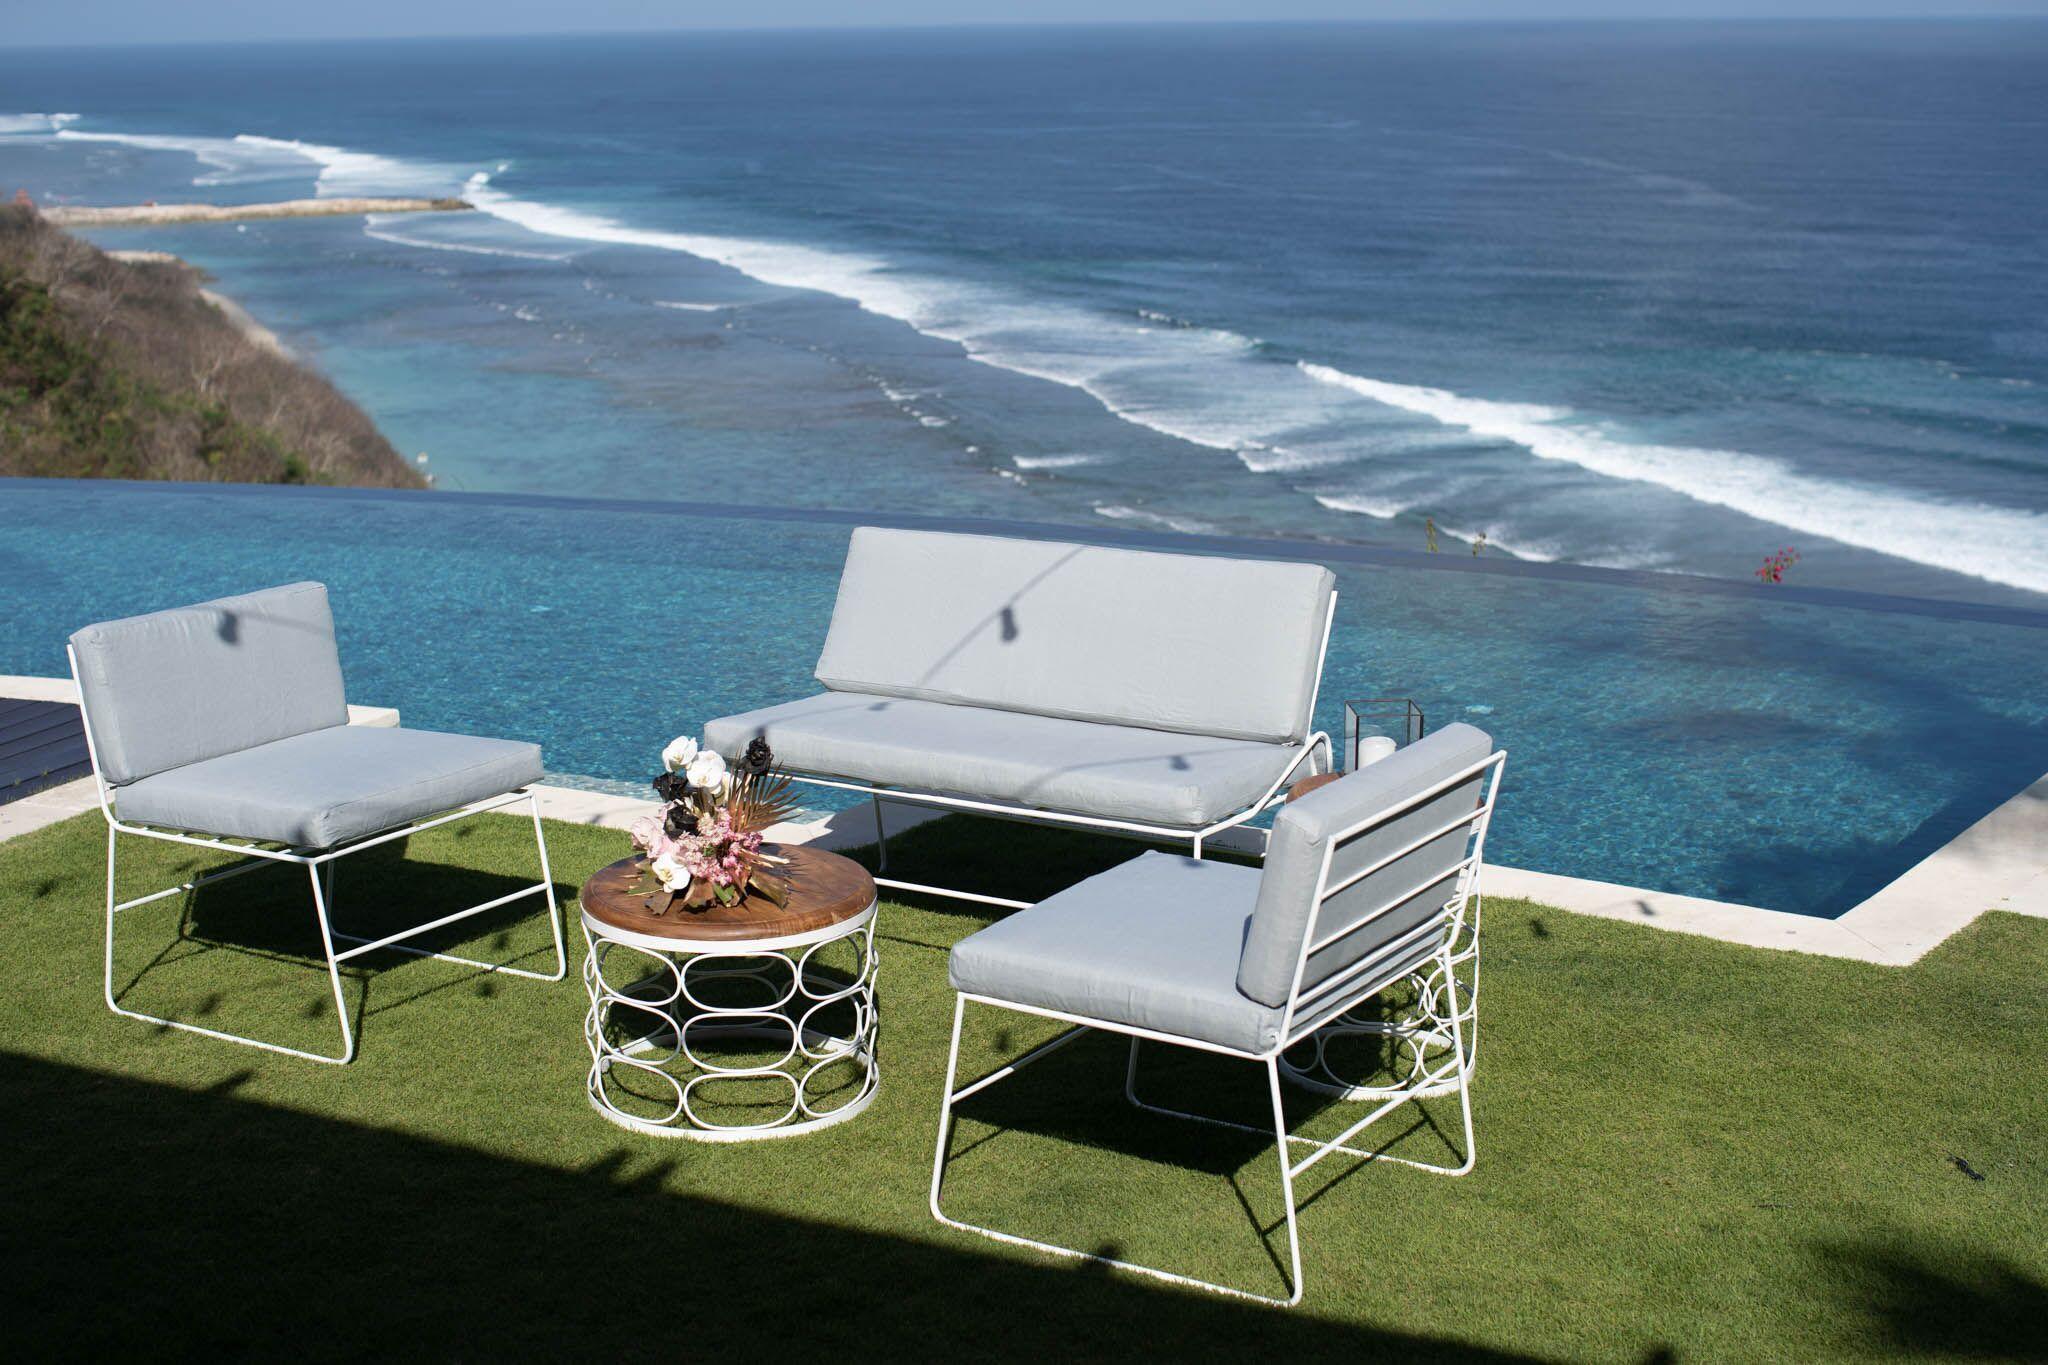 Wedding Furniture Rentals In Bali Wedding Furniture Rental Bali